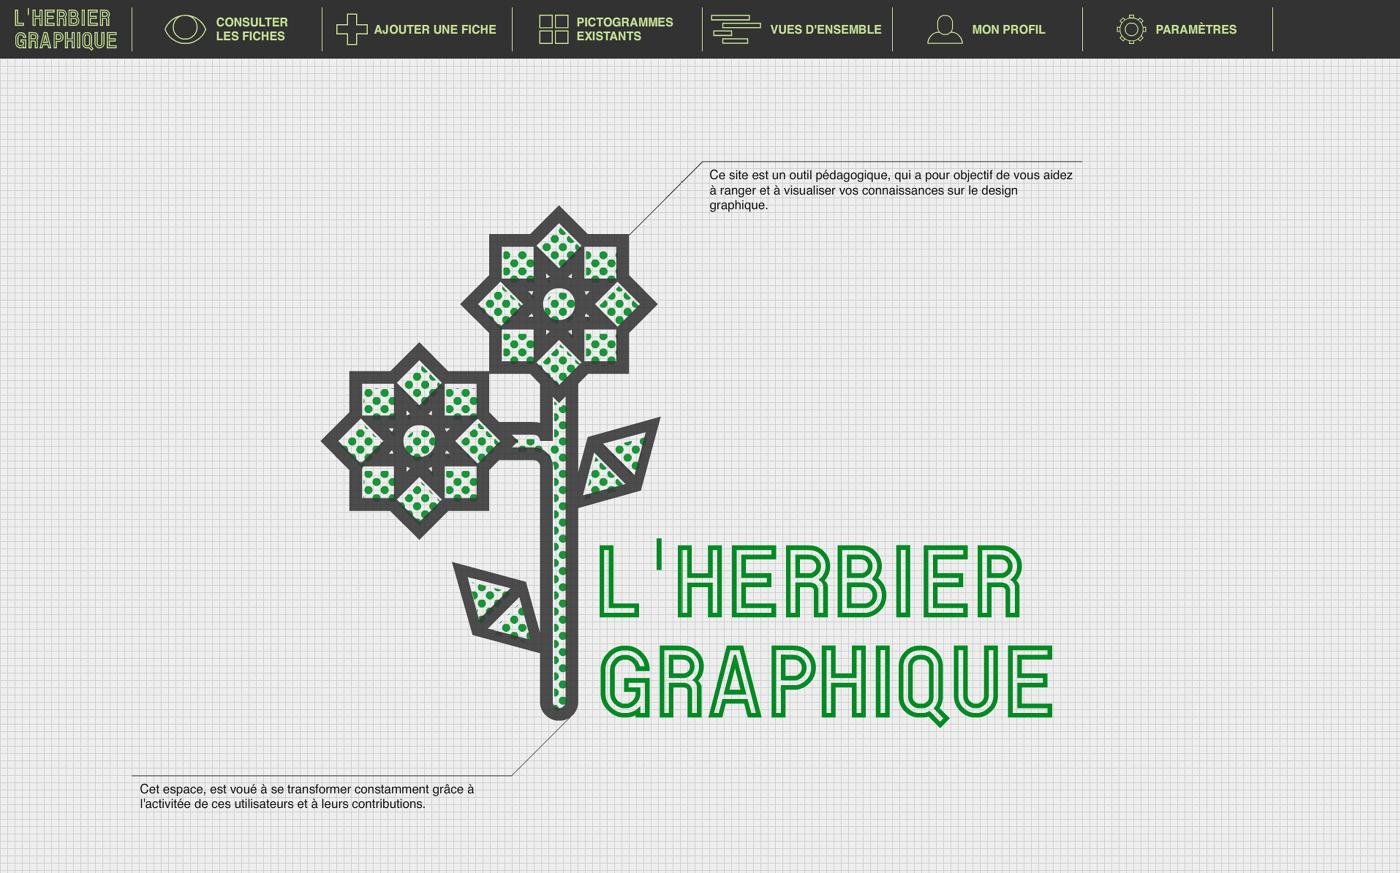 HERBIER_GRAPHIQUE_1